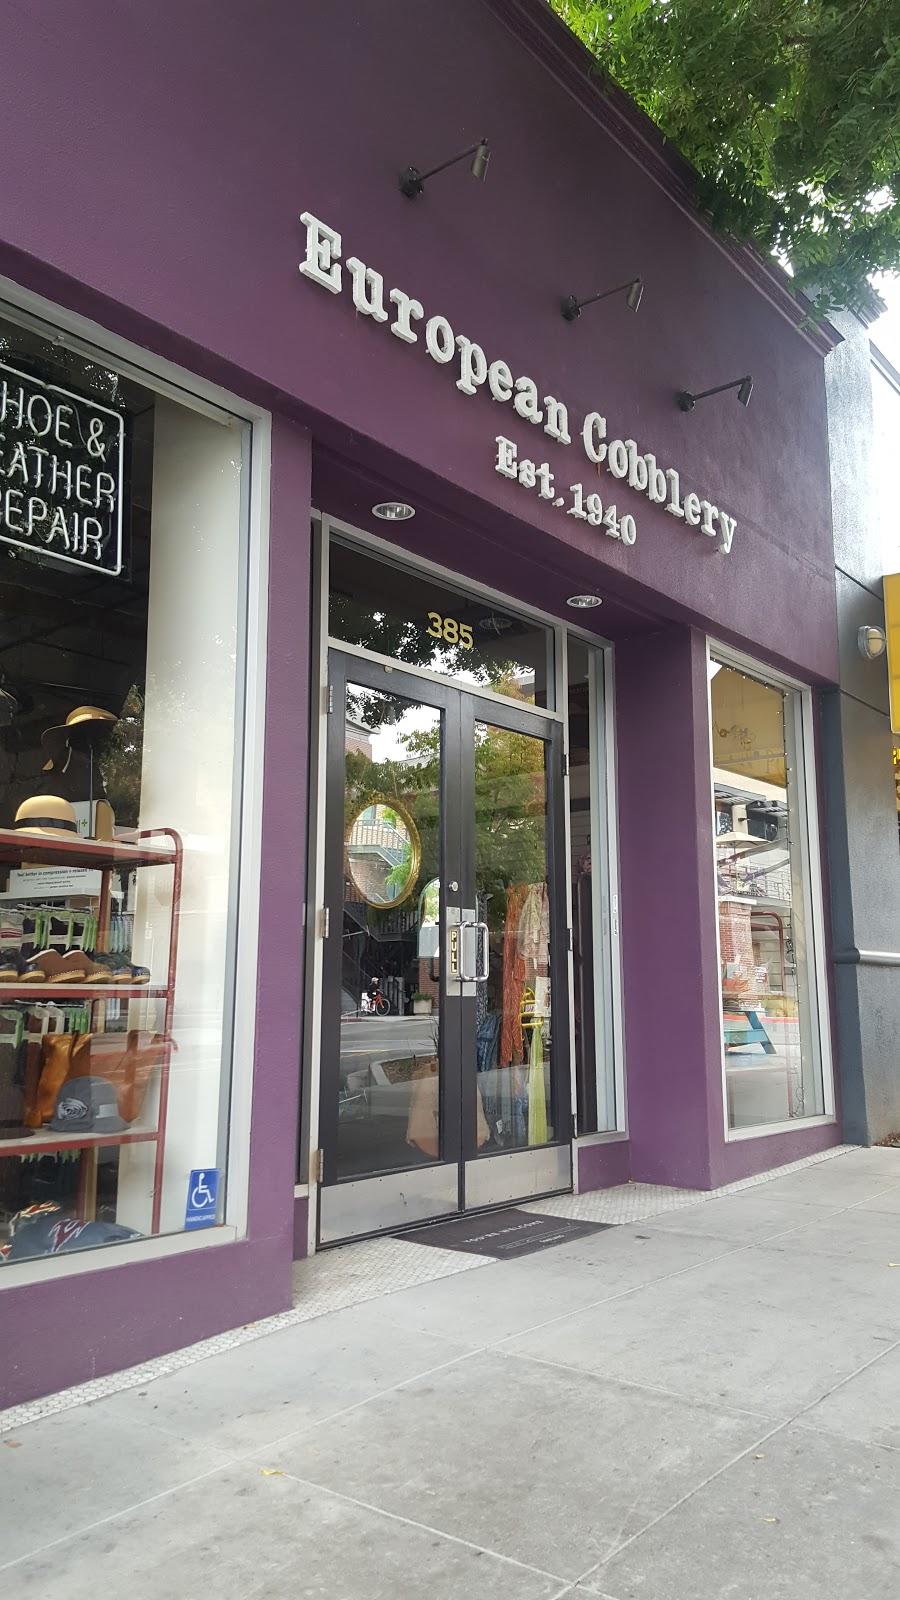 European Cobblery - shoe store  | Photo 2 of 4 | Address: 385 State St, Los Altos, CA 94022, USA | Phone: (650) 941-0143